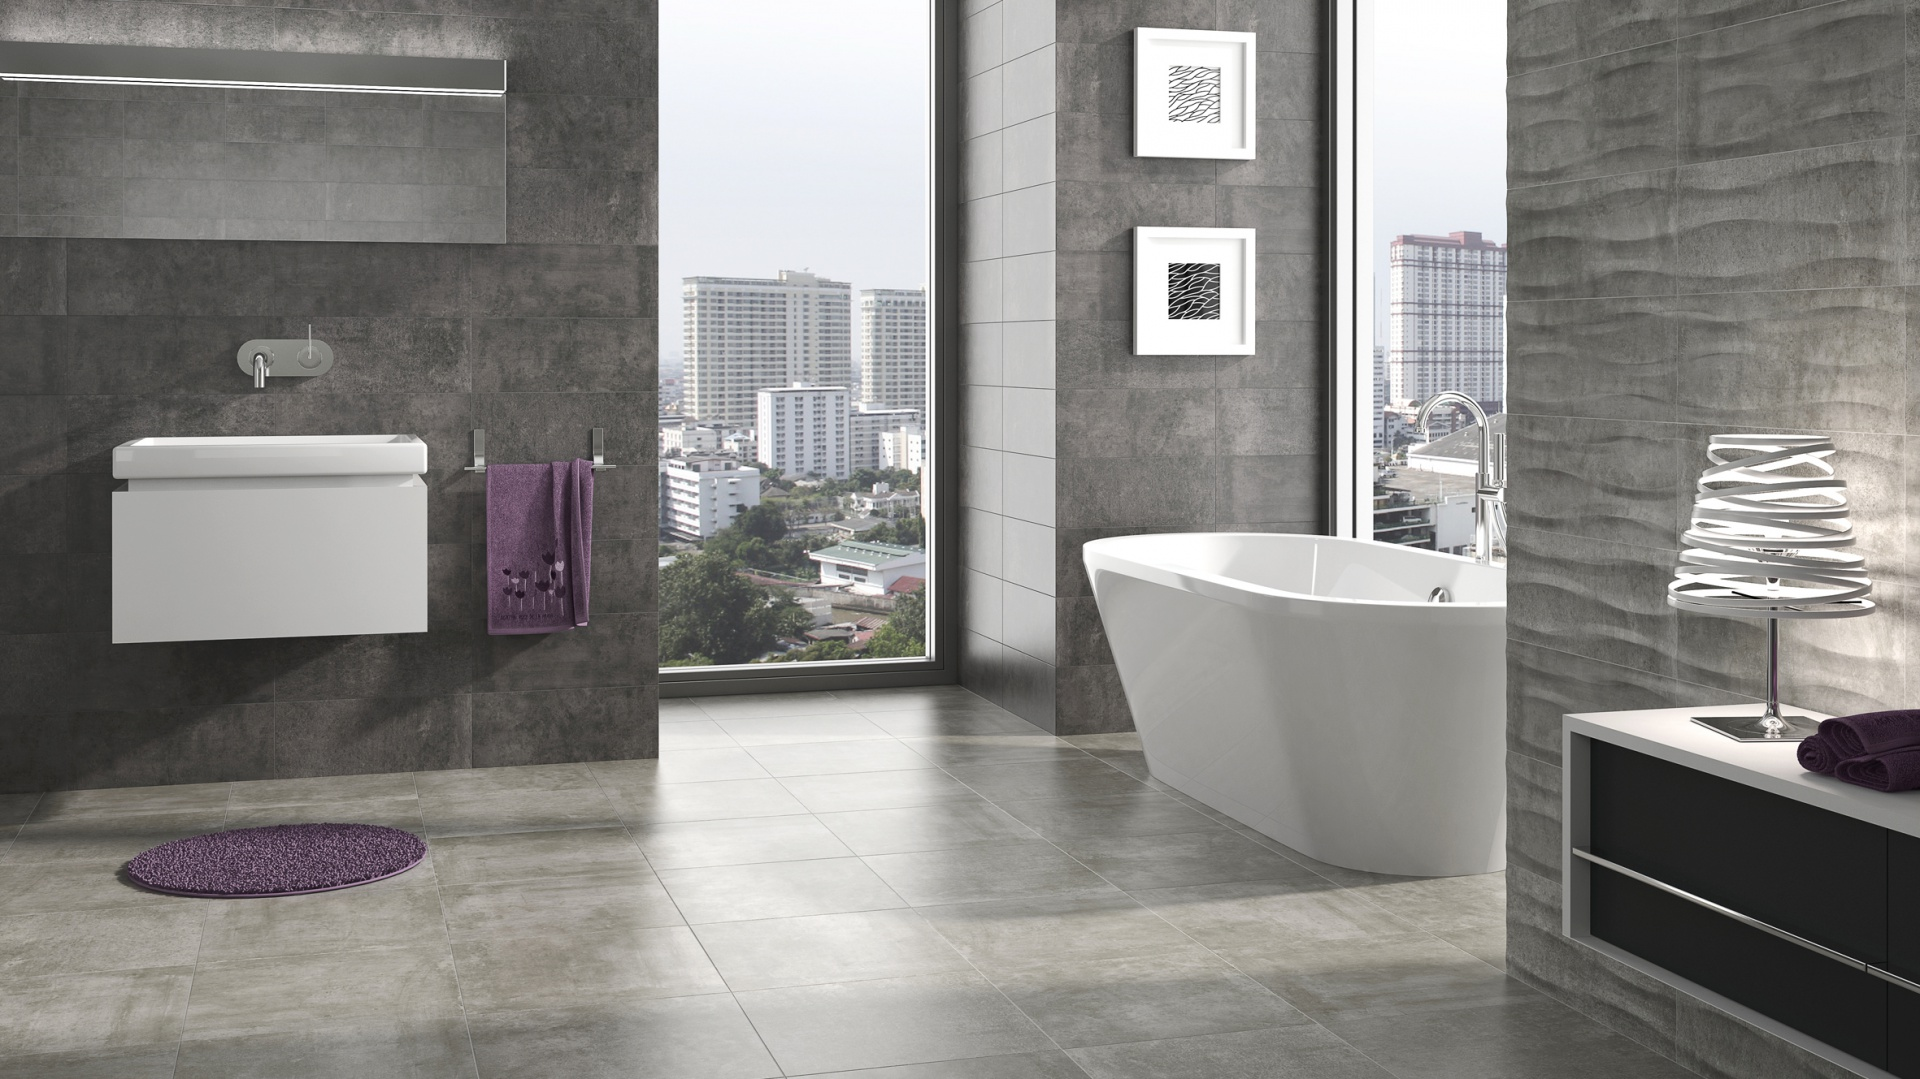 Wainscoting Bathroom Ideas Kolekcja Stadium Szare Płytki Do łazienki 15